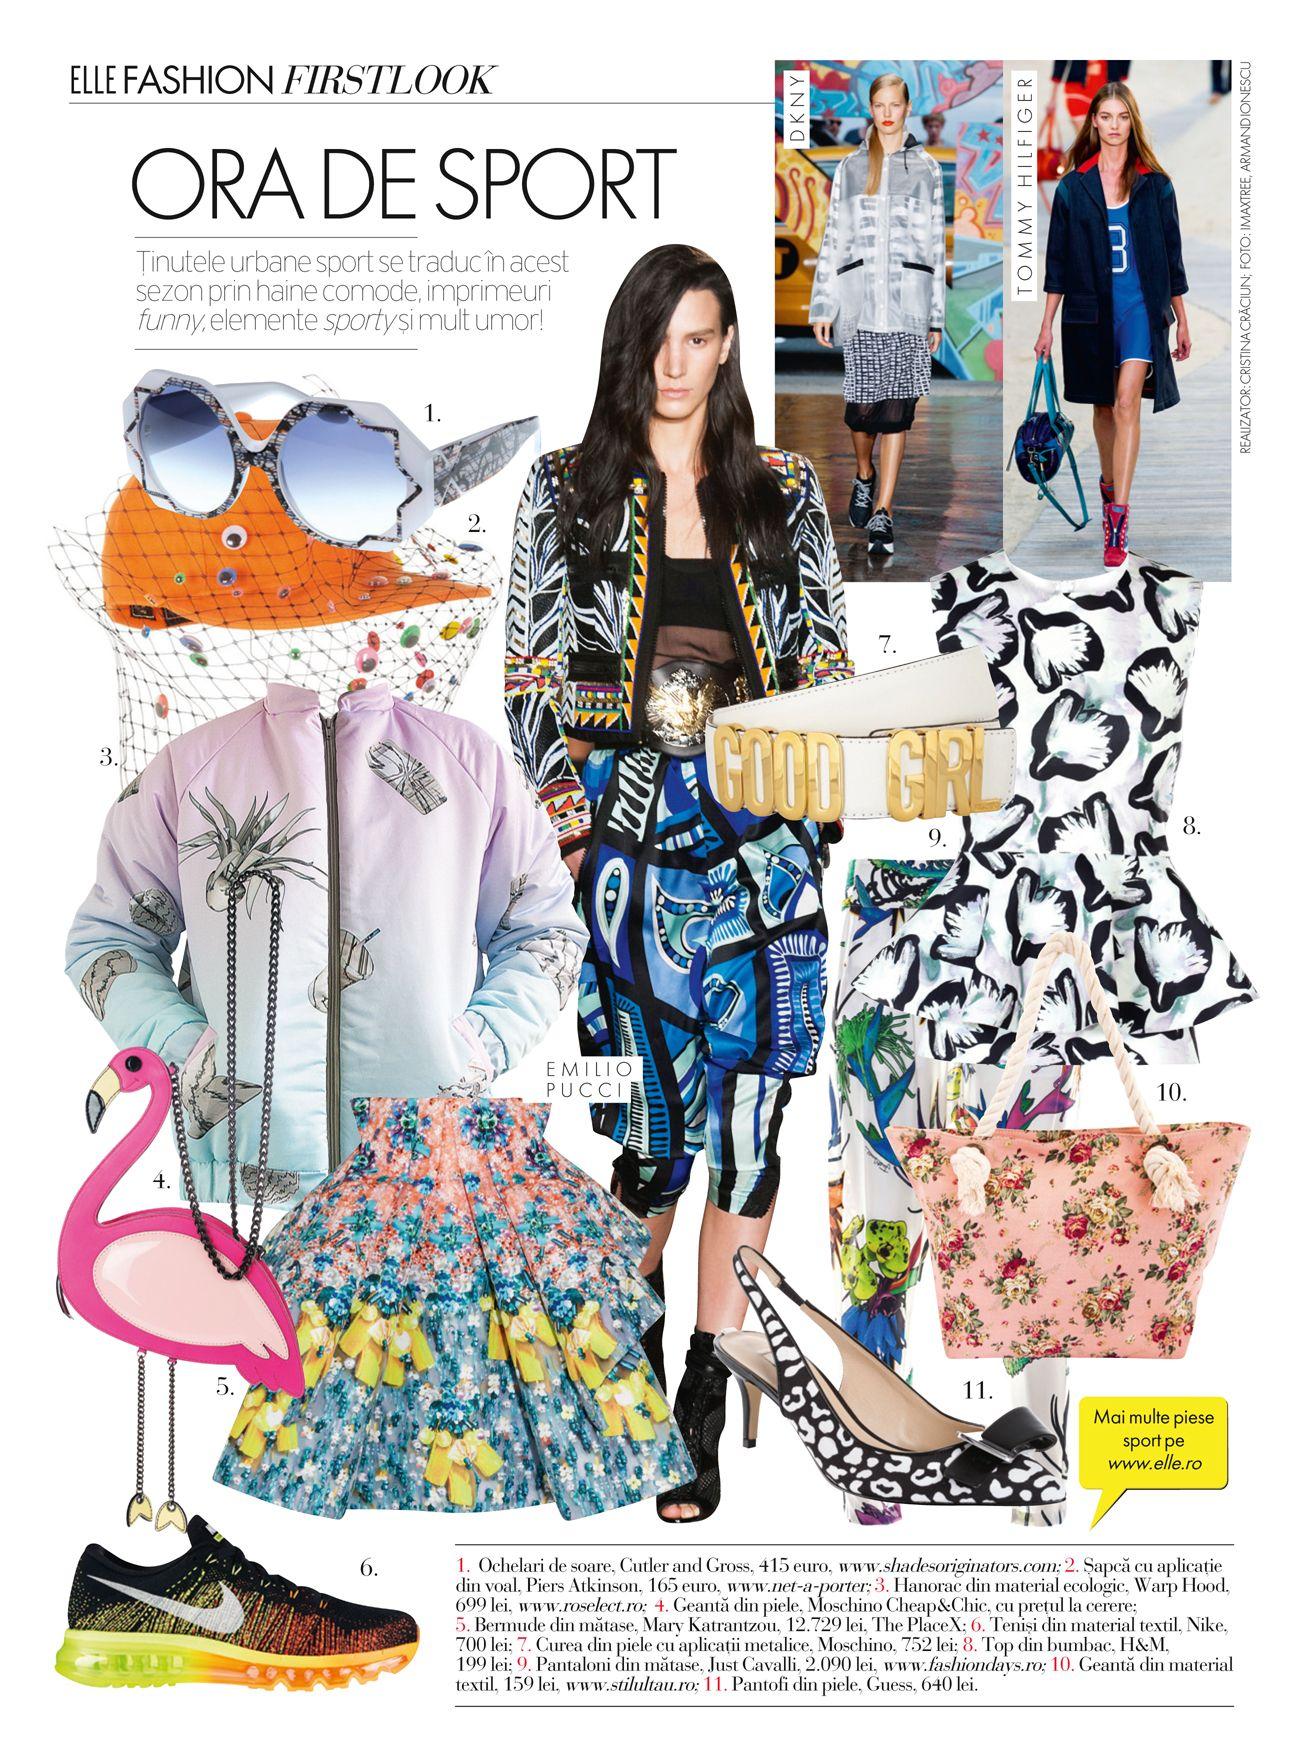 shadesoriginators featured in First Look ElleRomania